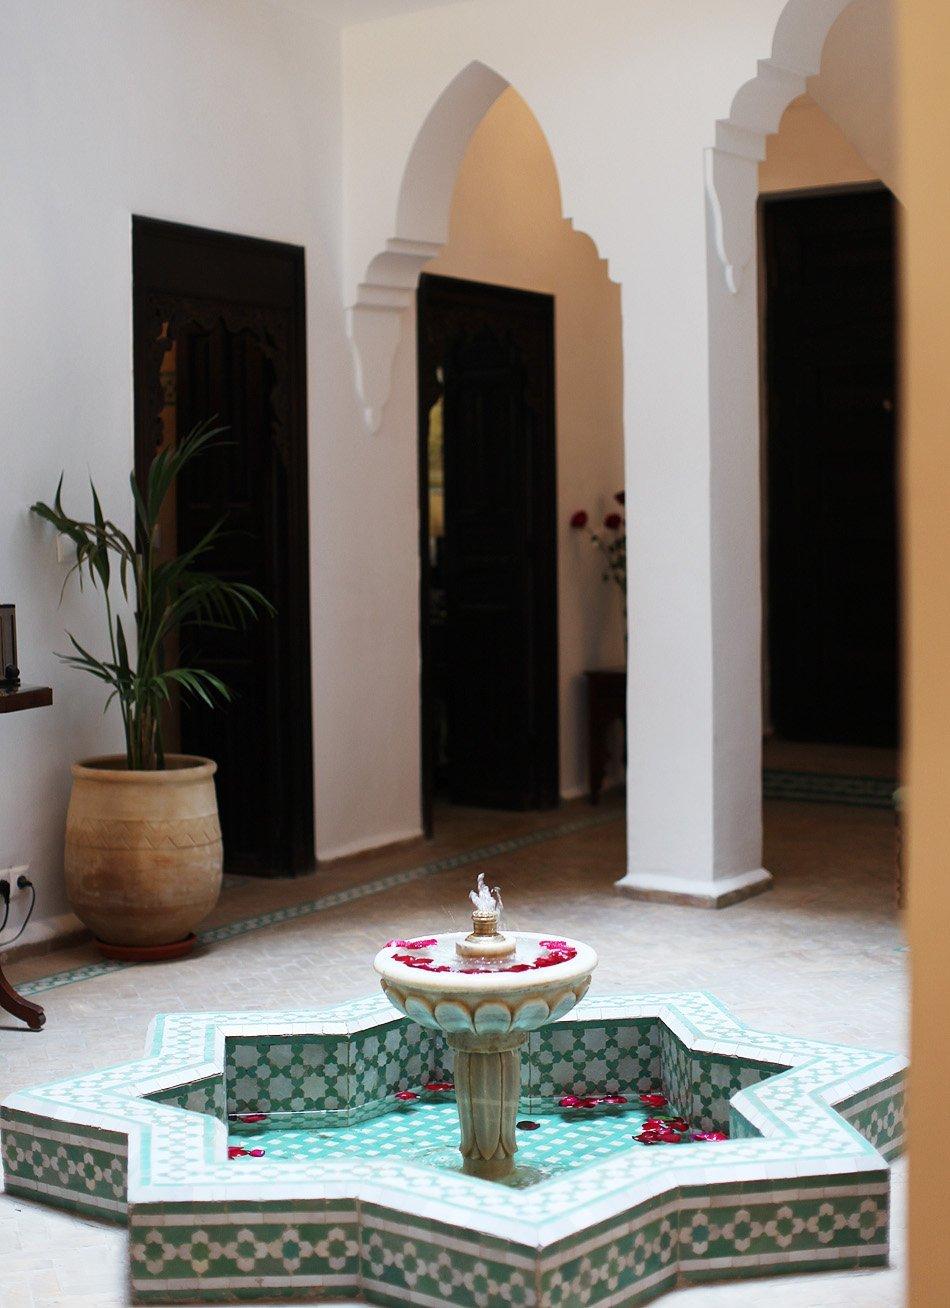 Hotel Maison Blanche, Tangier, Morocco | Travel | #projectinspo